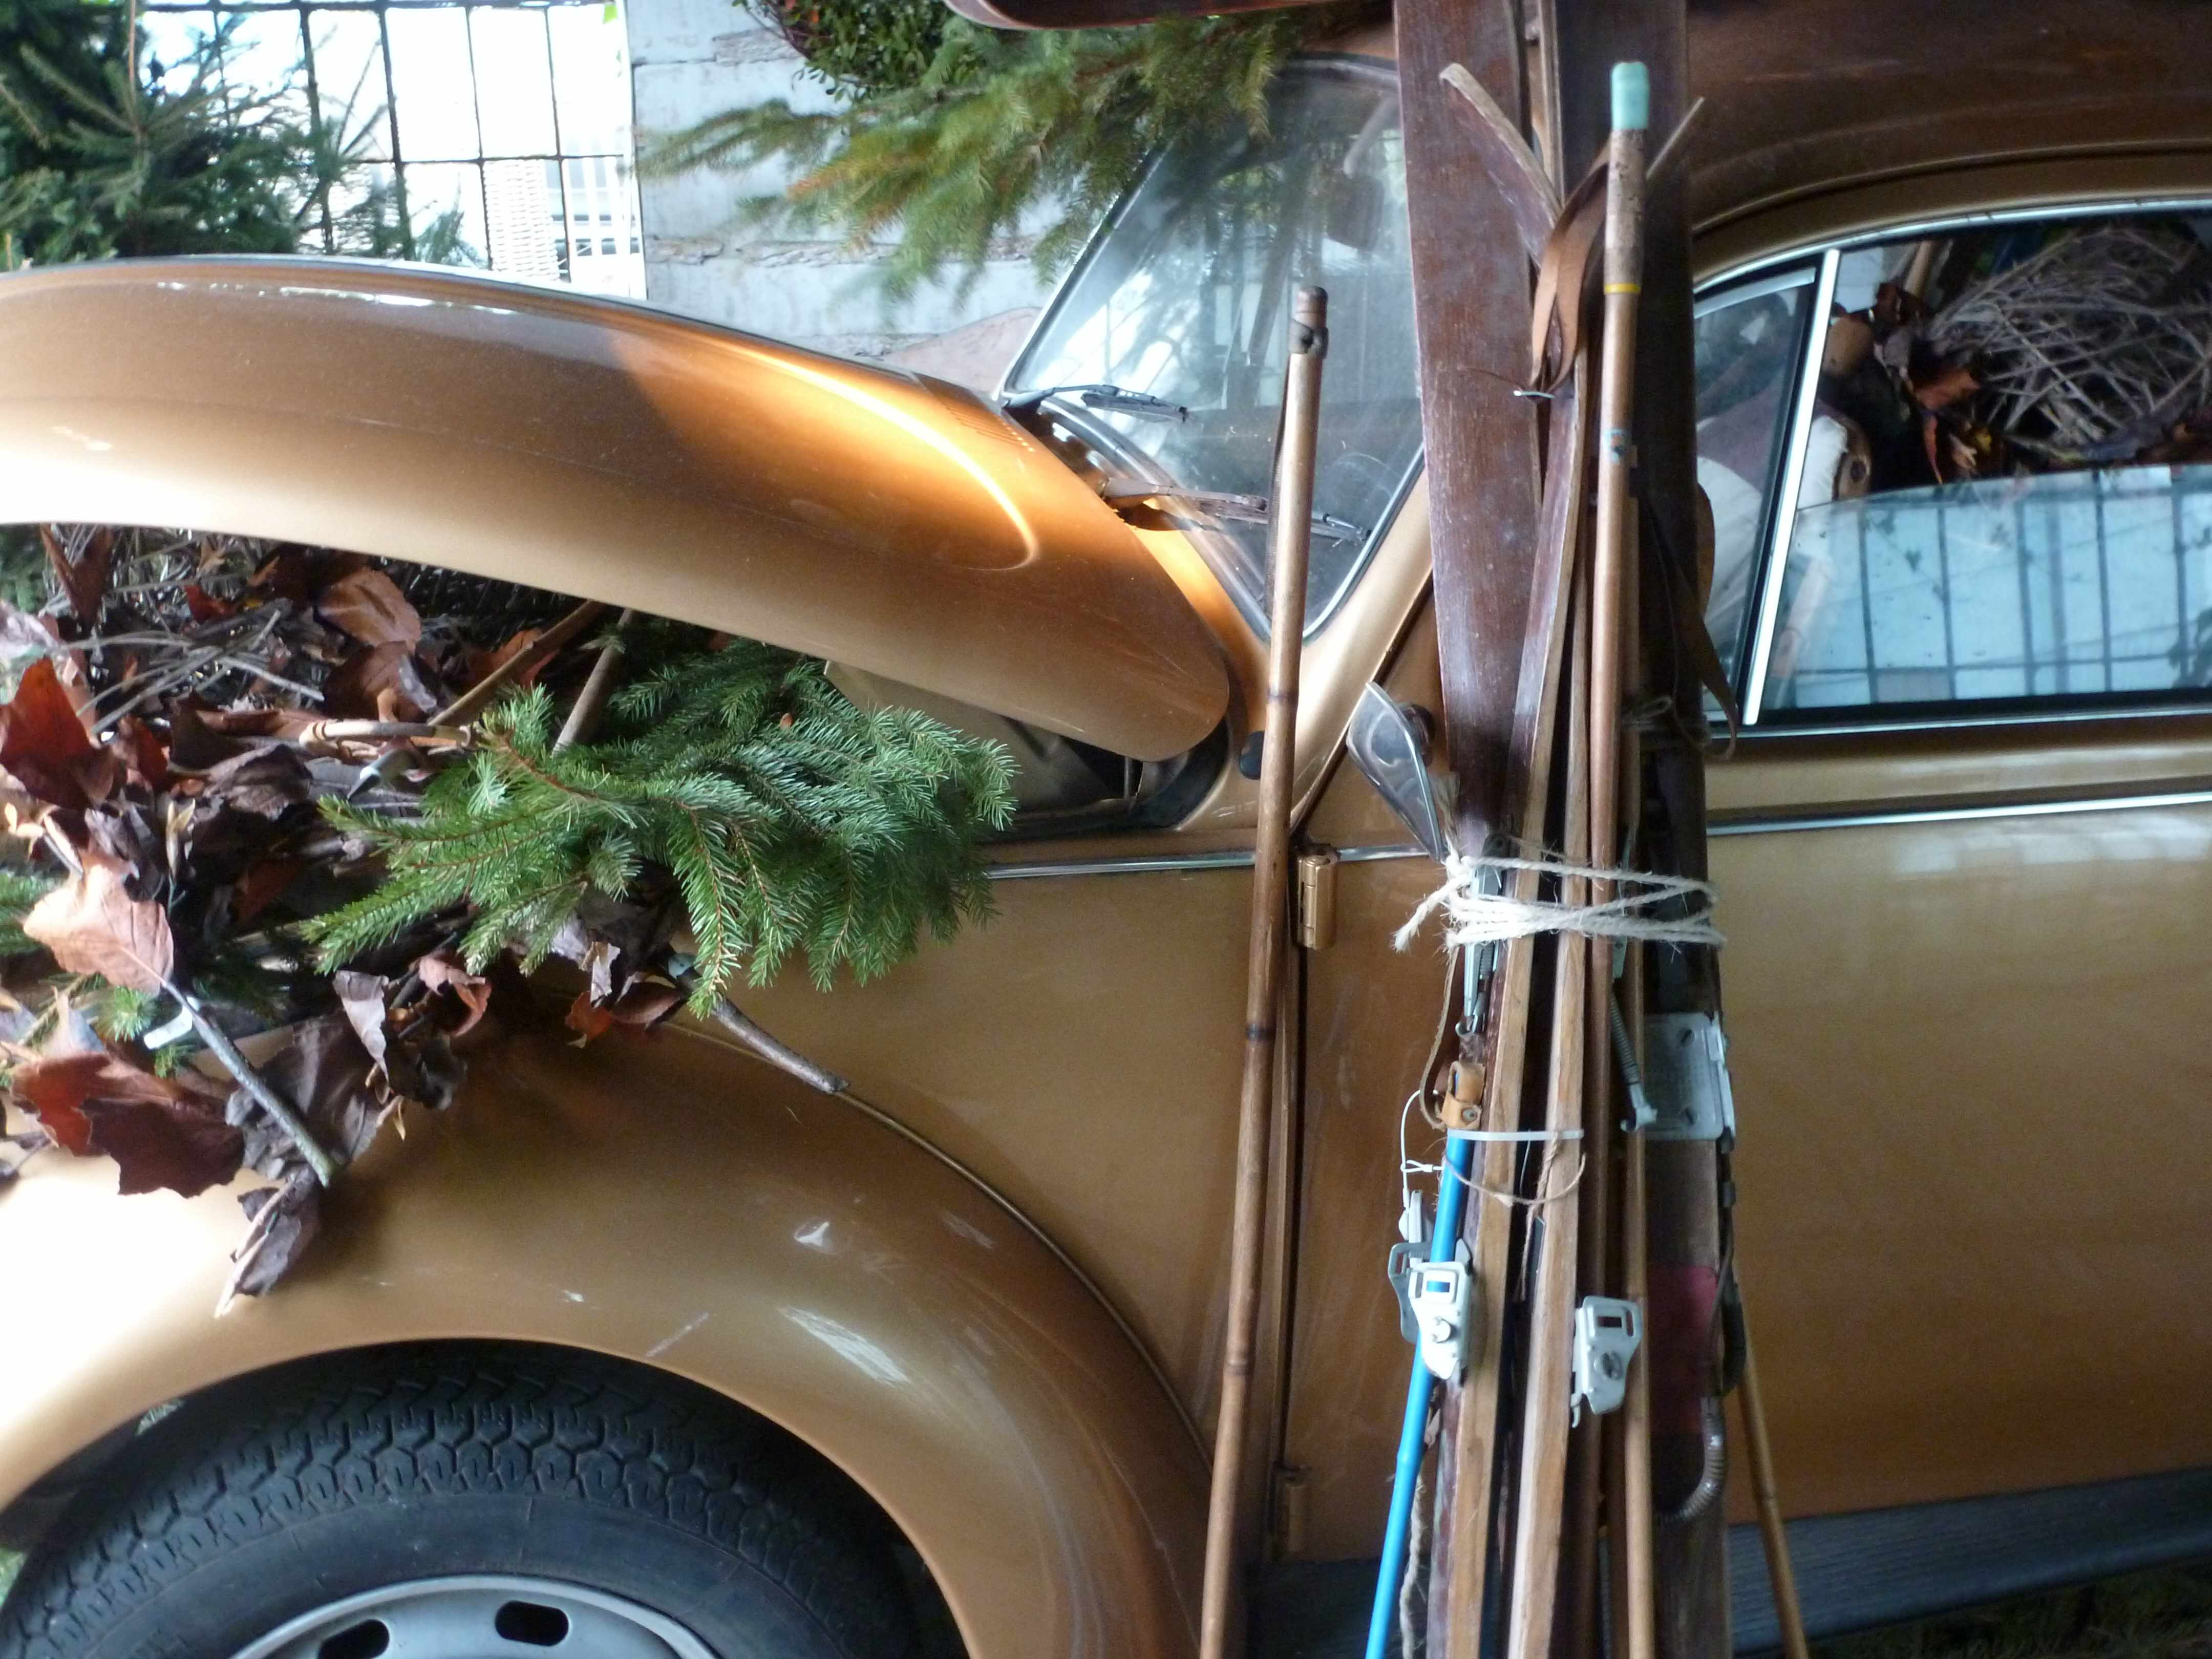 Automobile WV doree Noel 2012 Slots